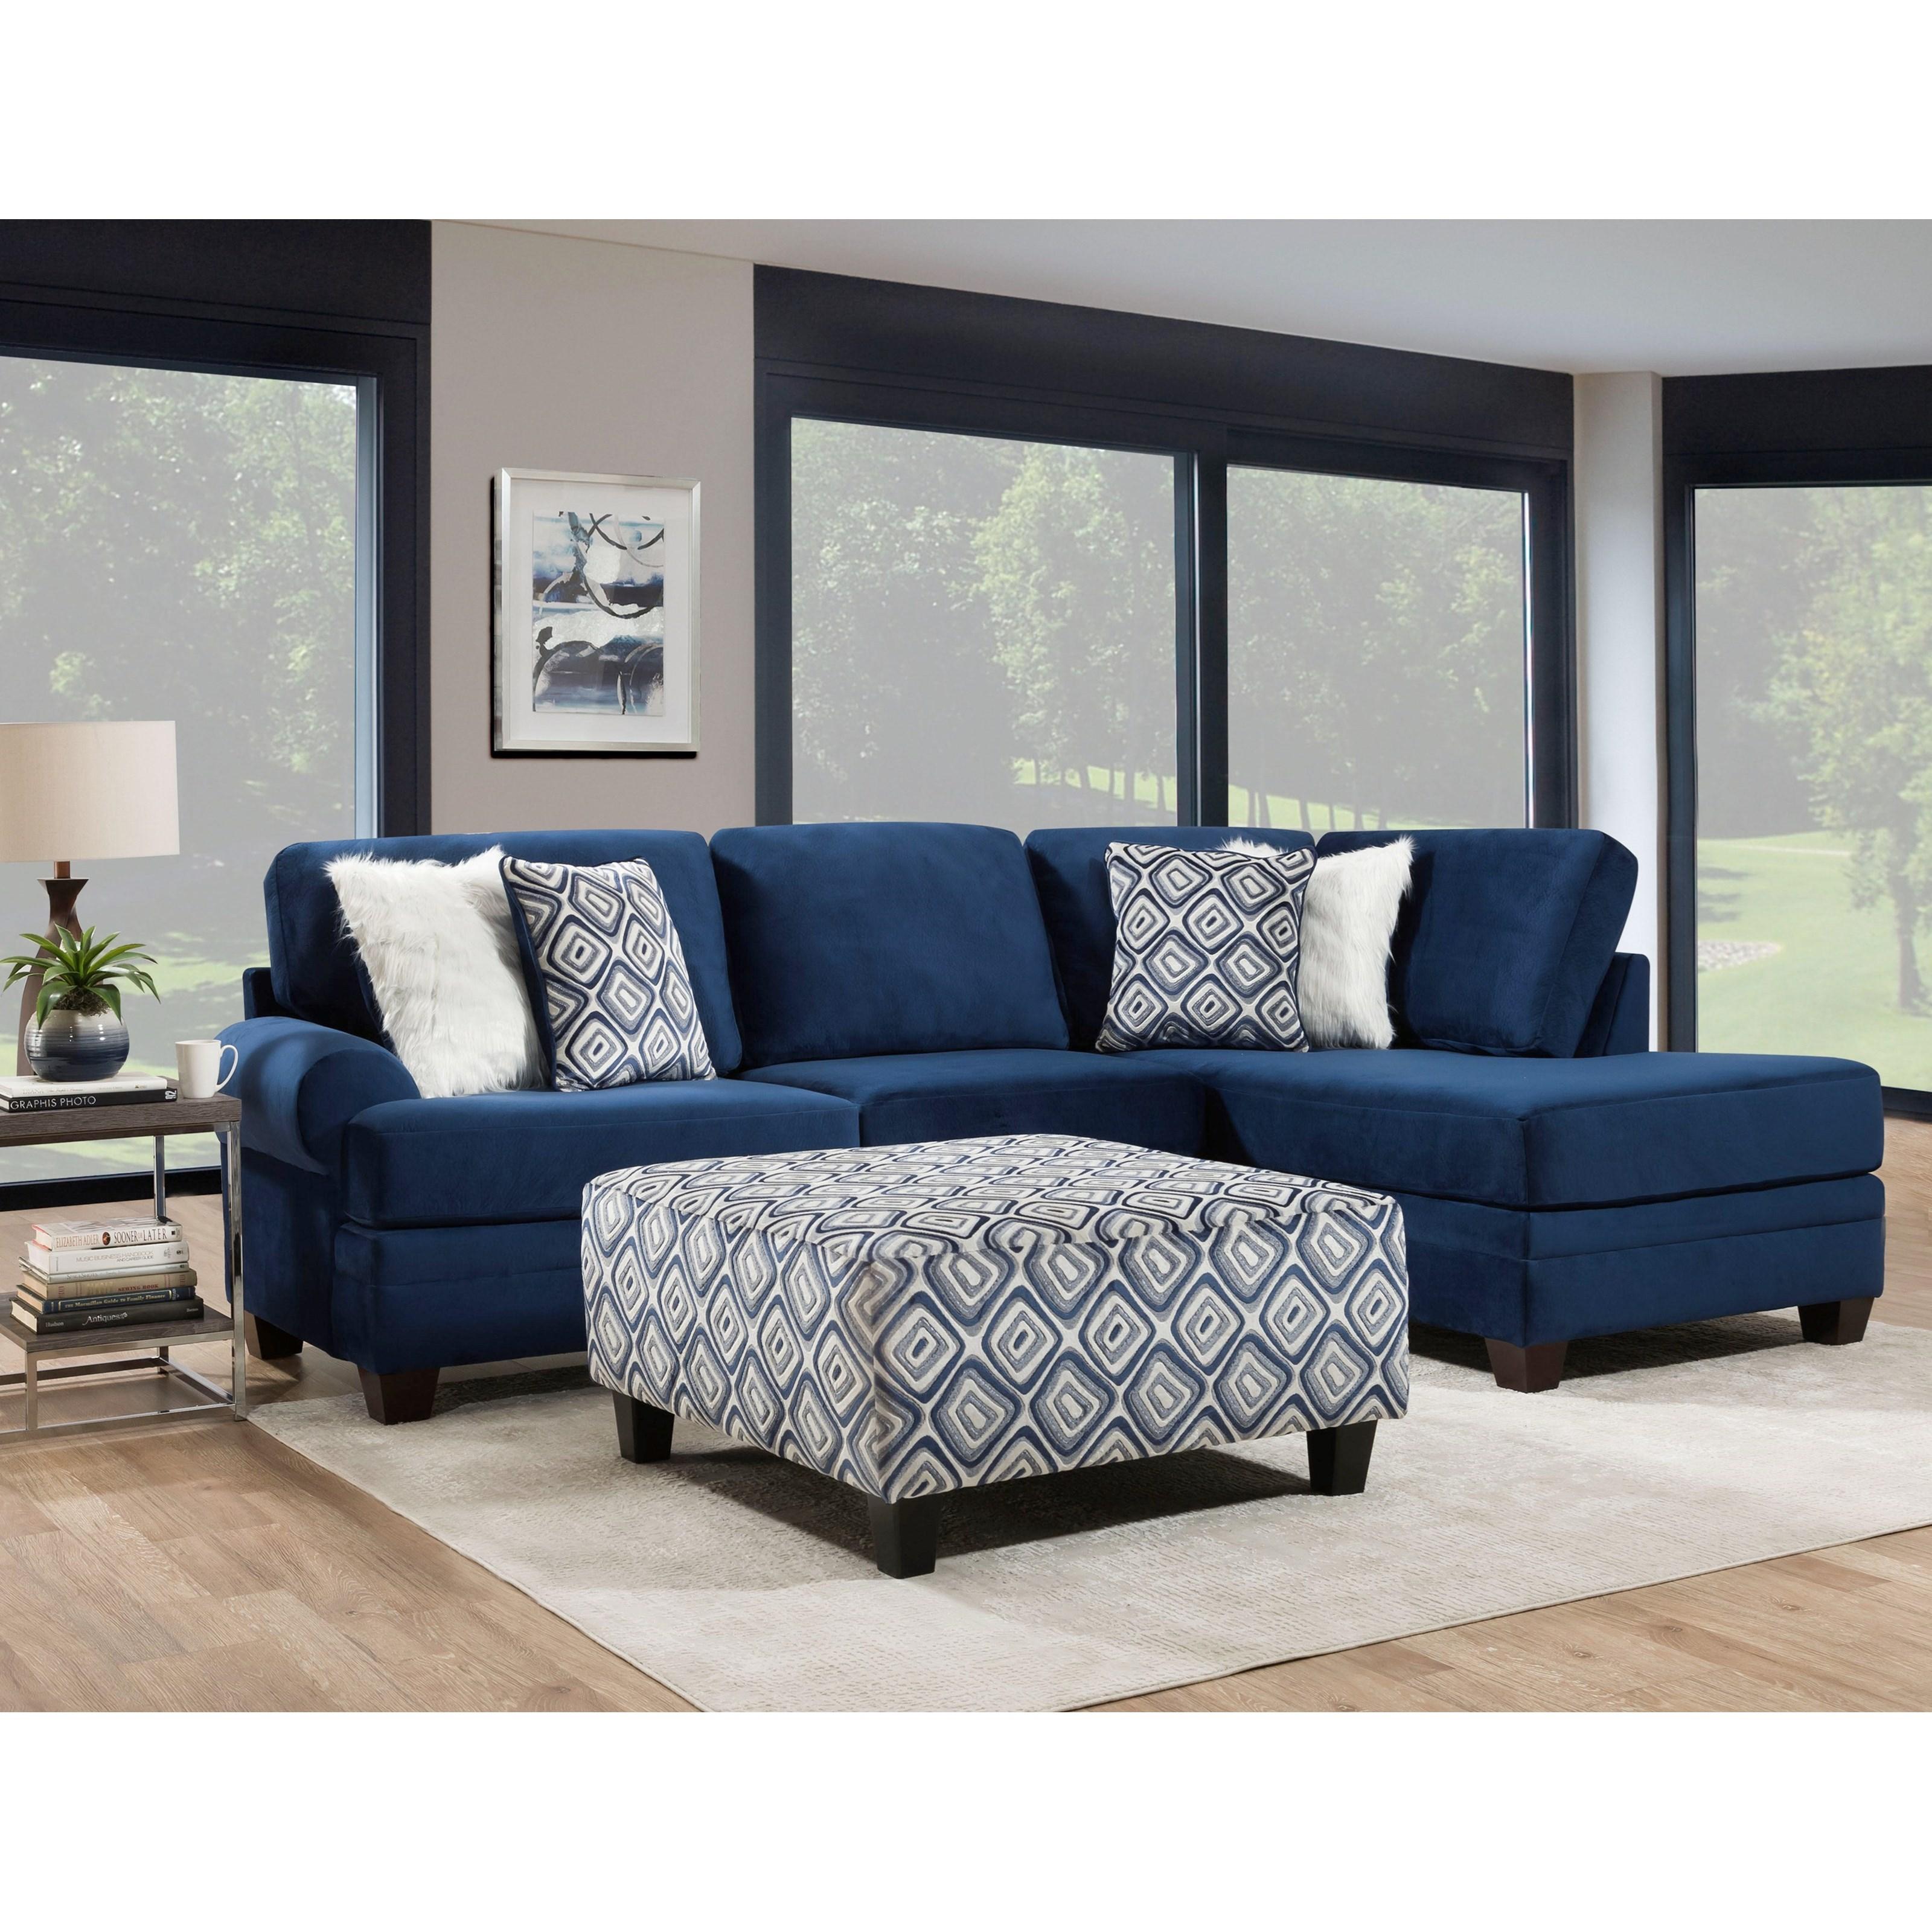 8642 Sectional by Albany at Furniture Fair - North Carolina